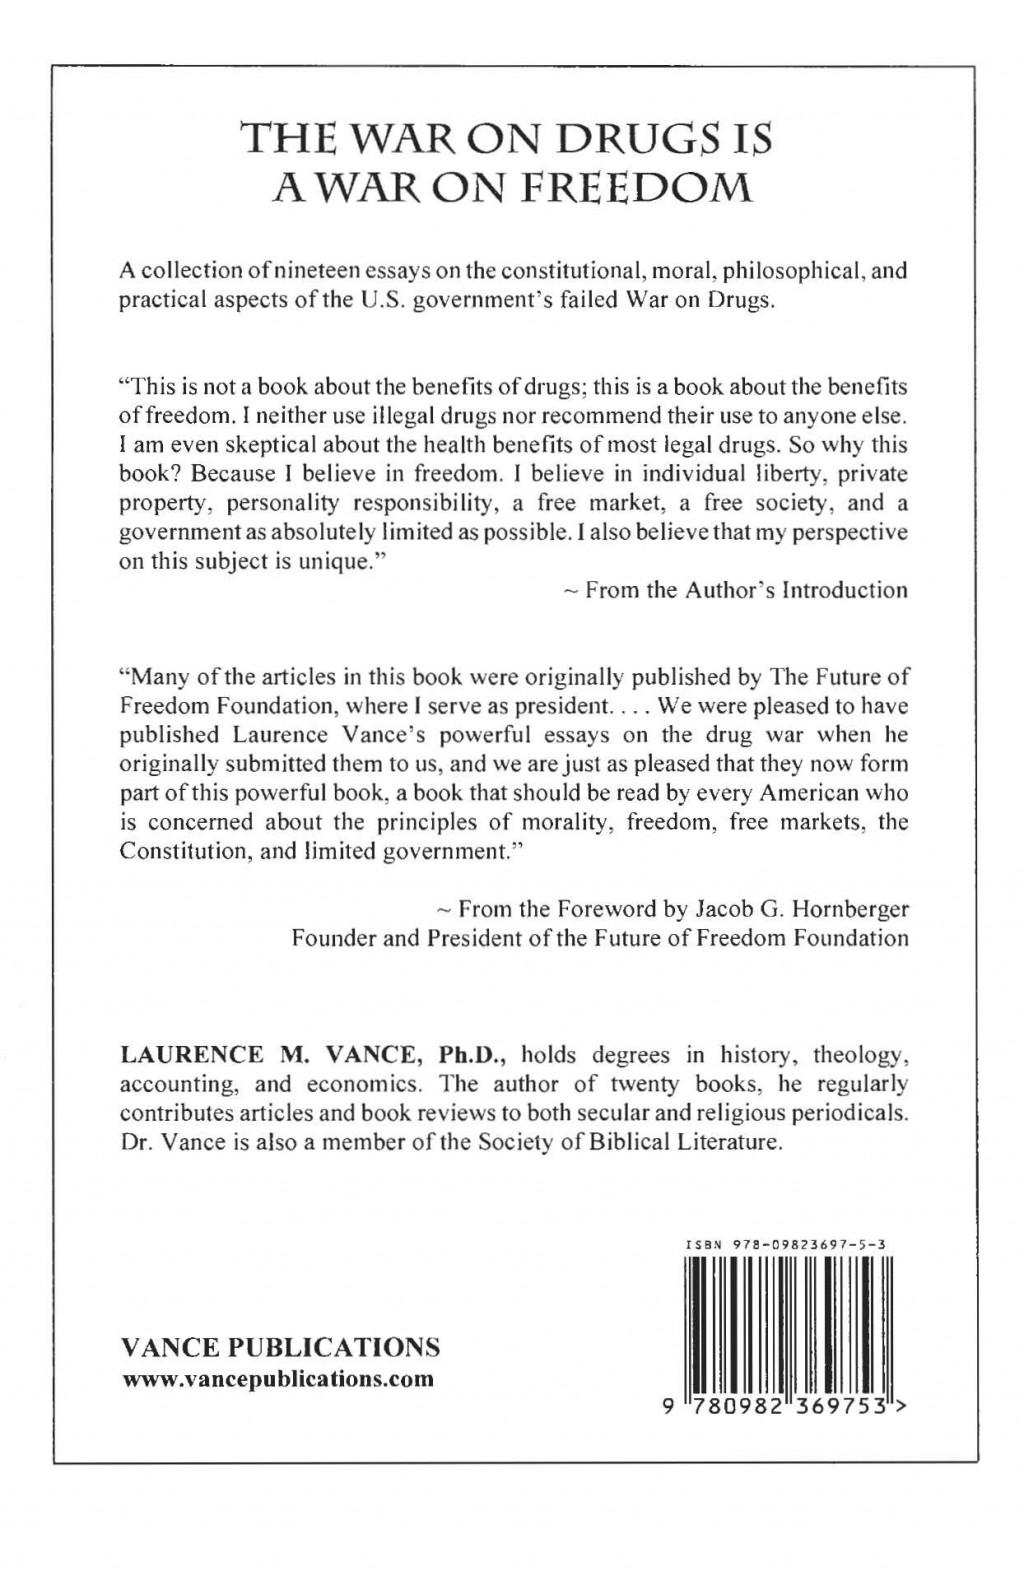 024 Essay Example Essays About Drugs 81h Stirring Short Tagalog Persuasive Illegal Argumentative Addiction Large